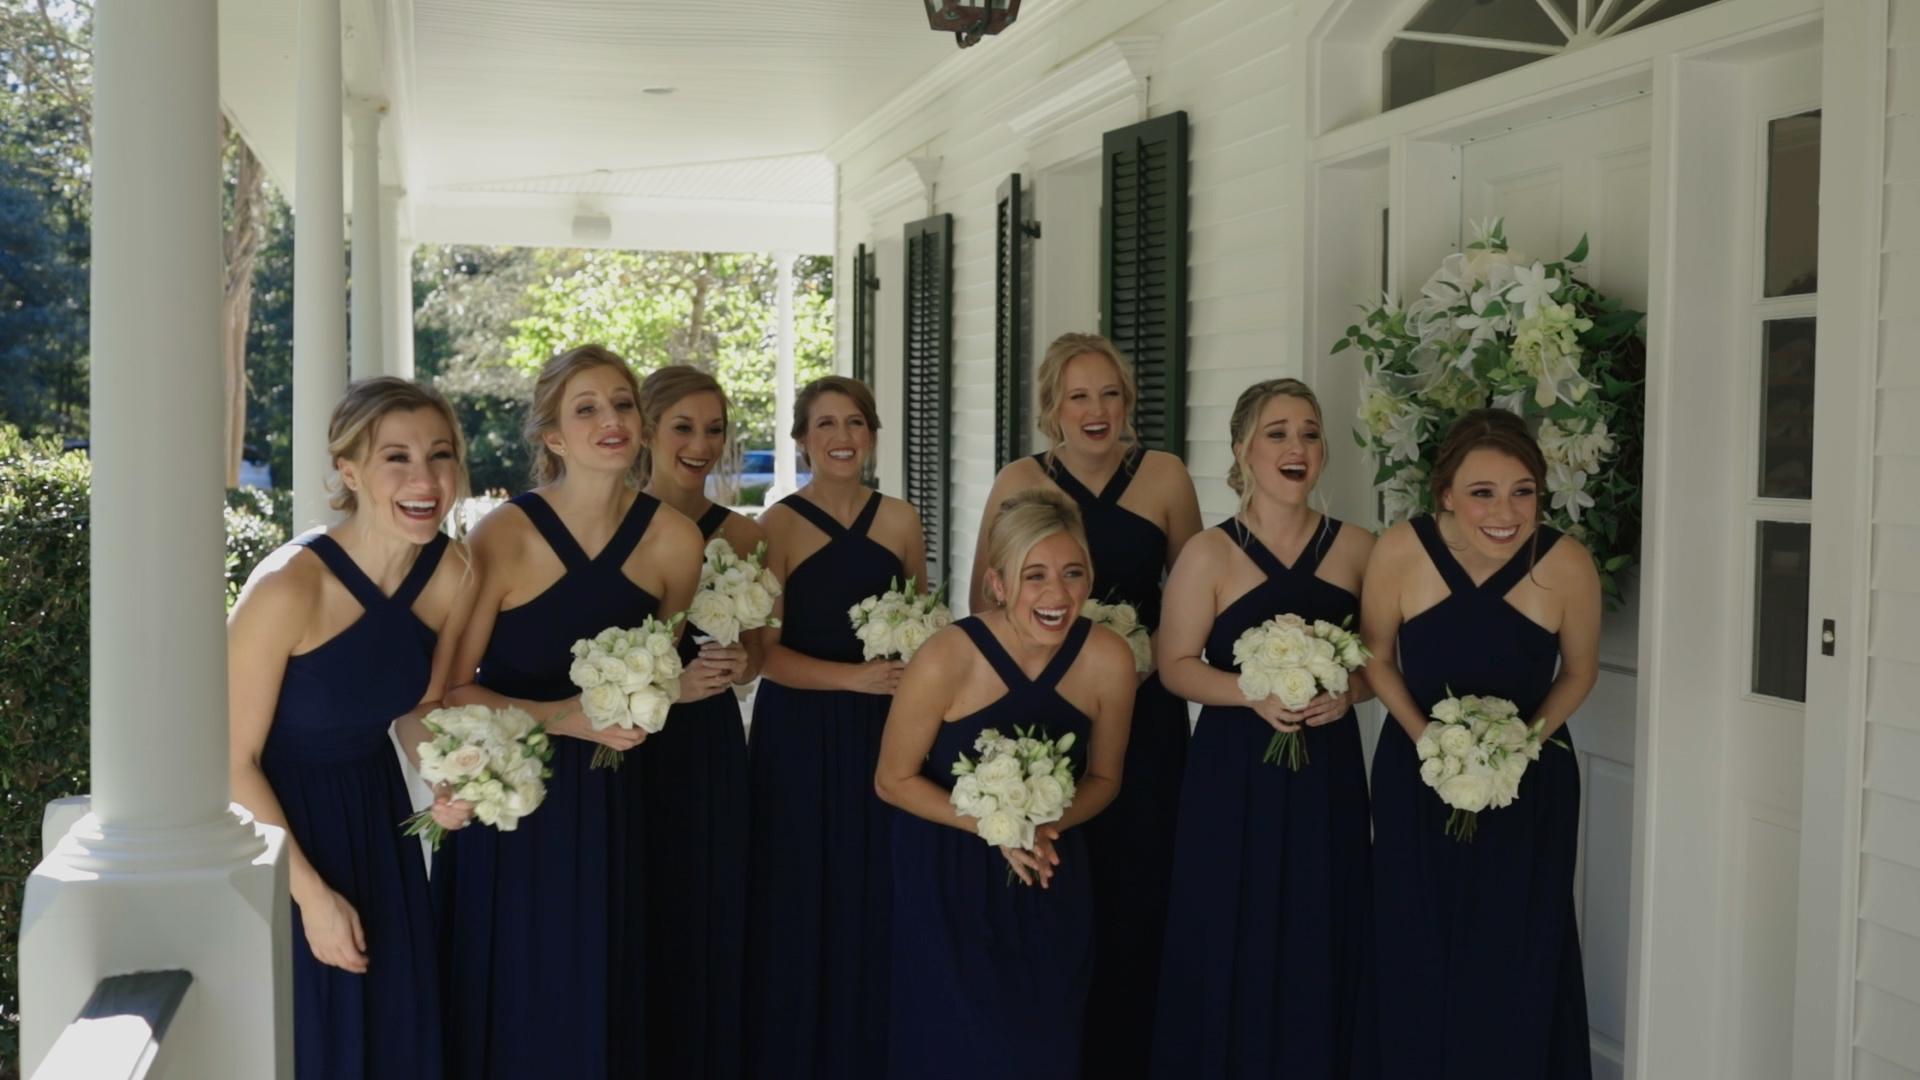 Covington Wedding Video - Bride Film - Navy Bridesmaid Dress